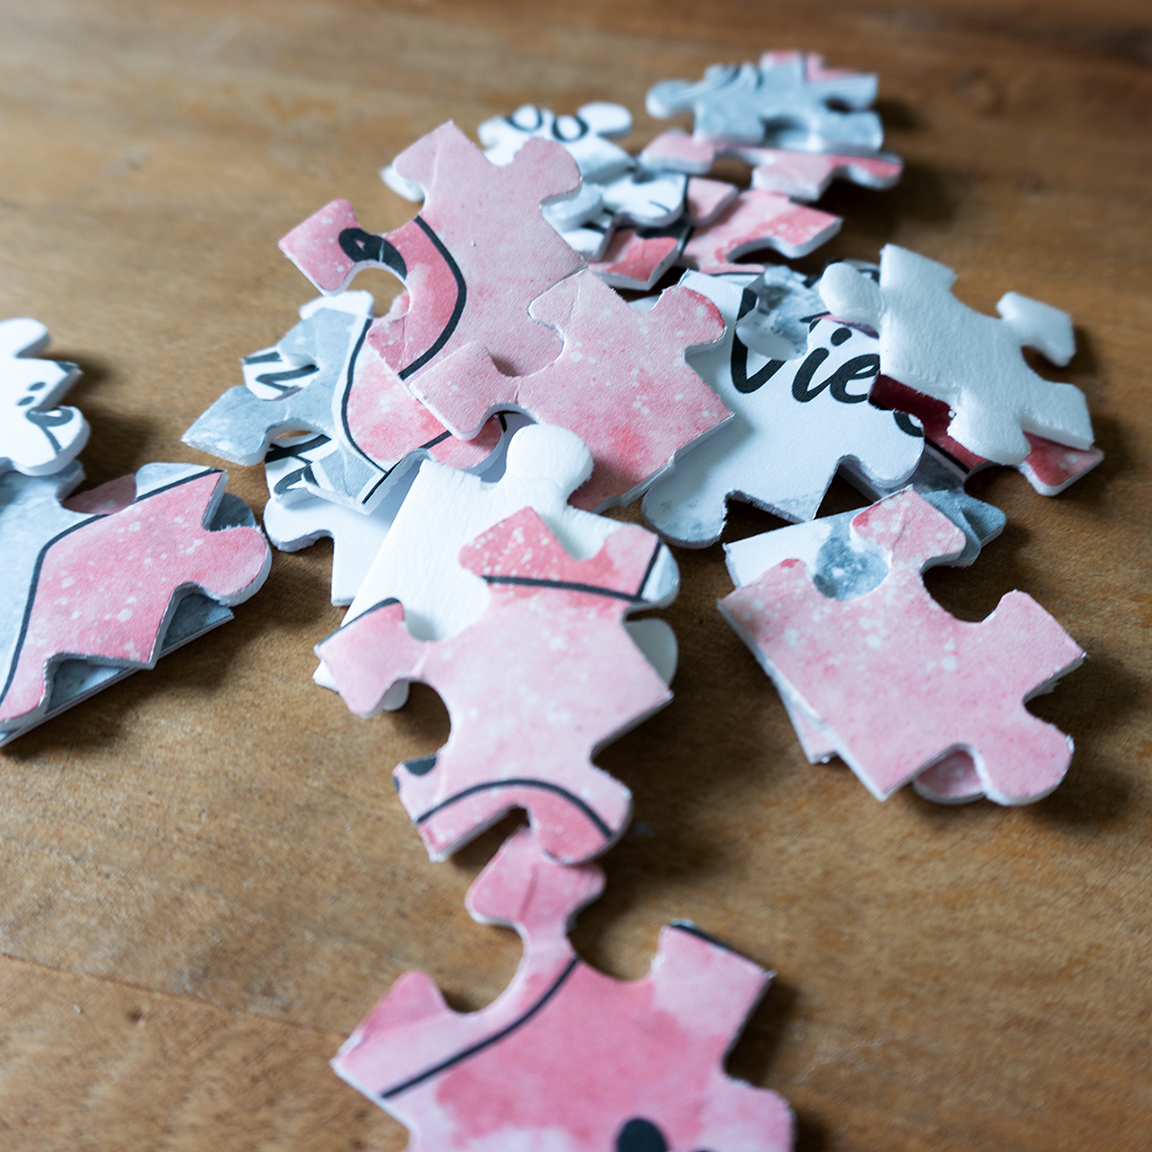 Produkte_Puzzle_nahaufnahme Kopie